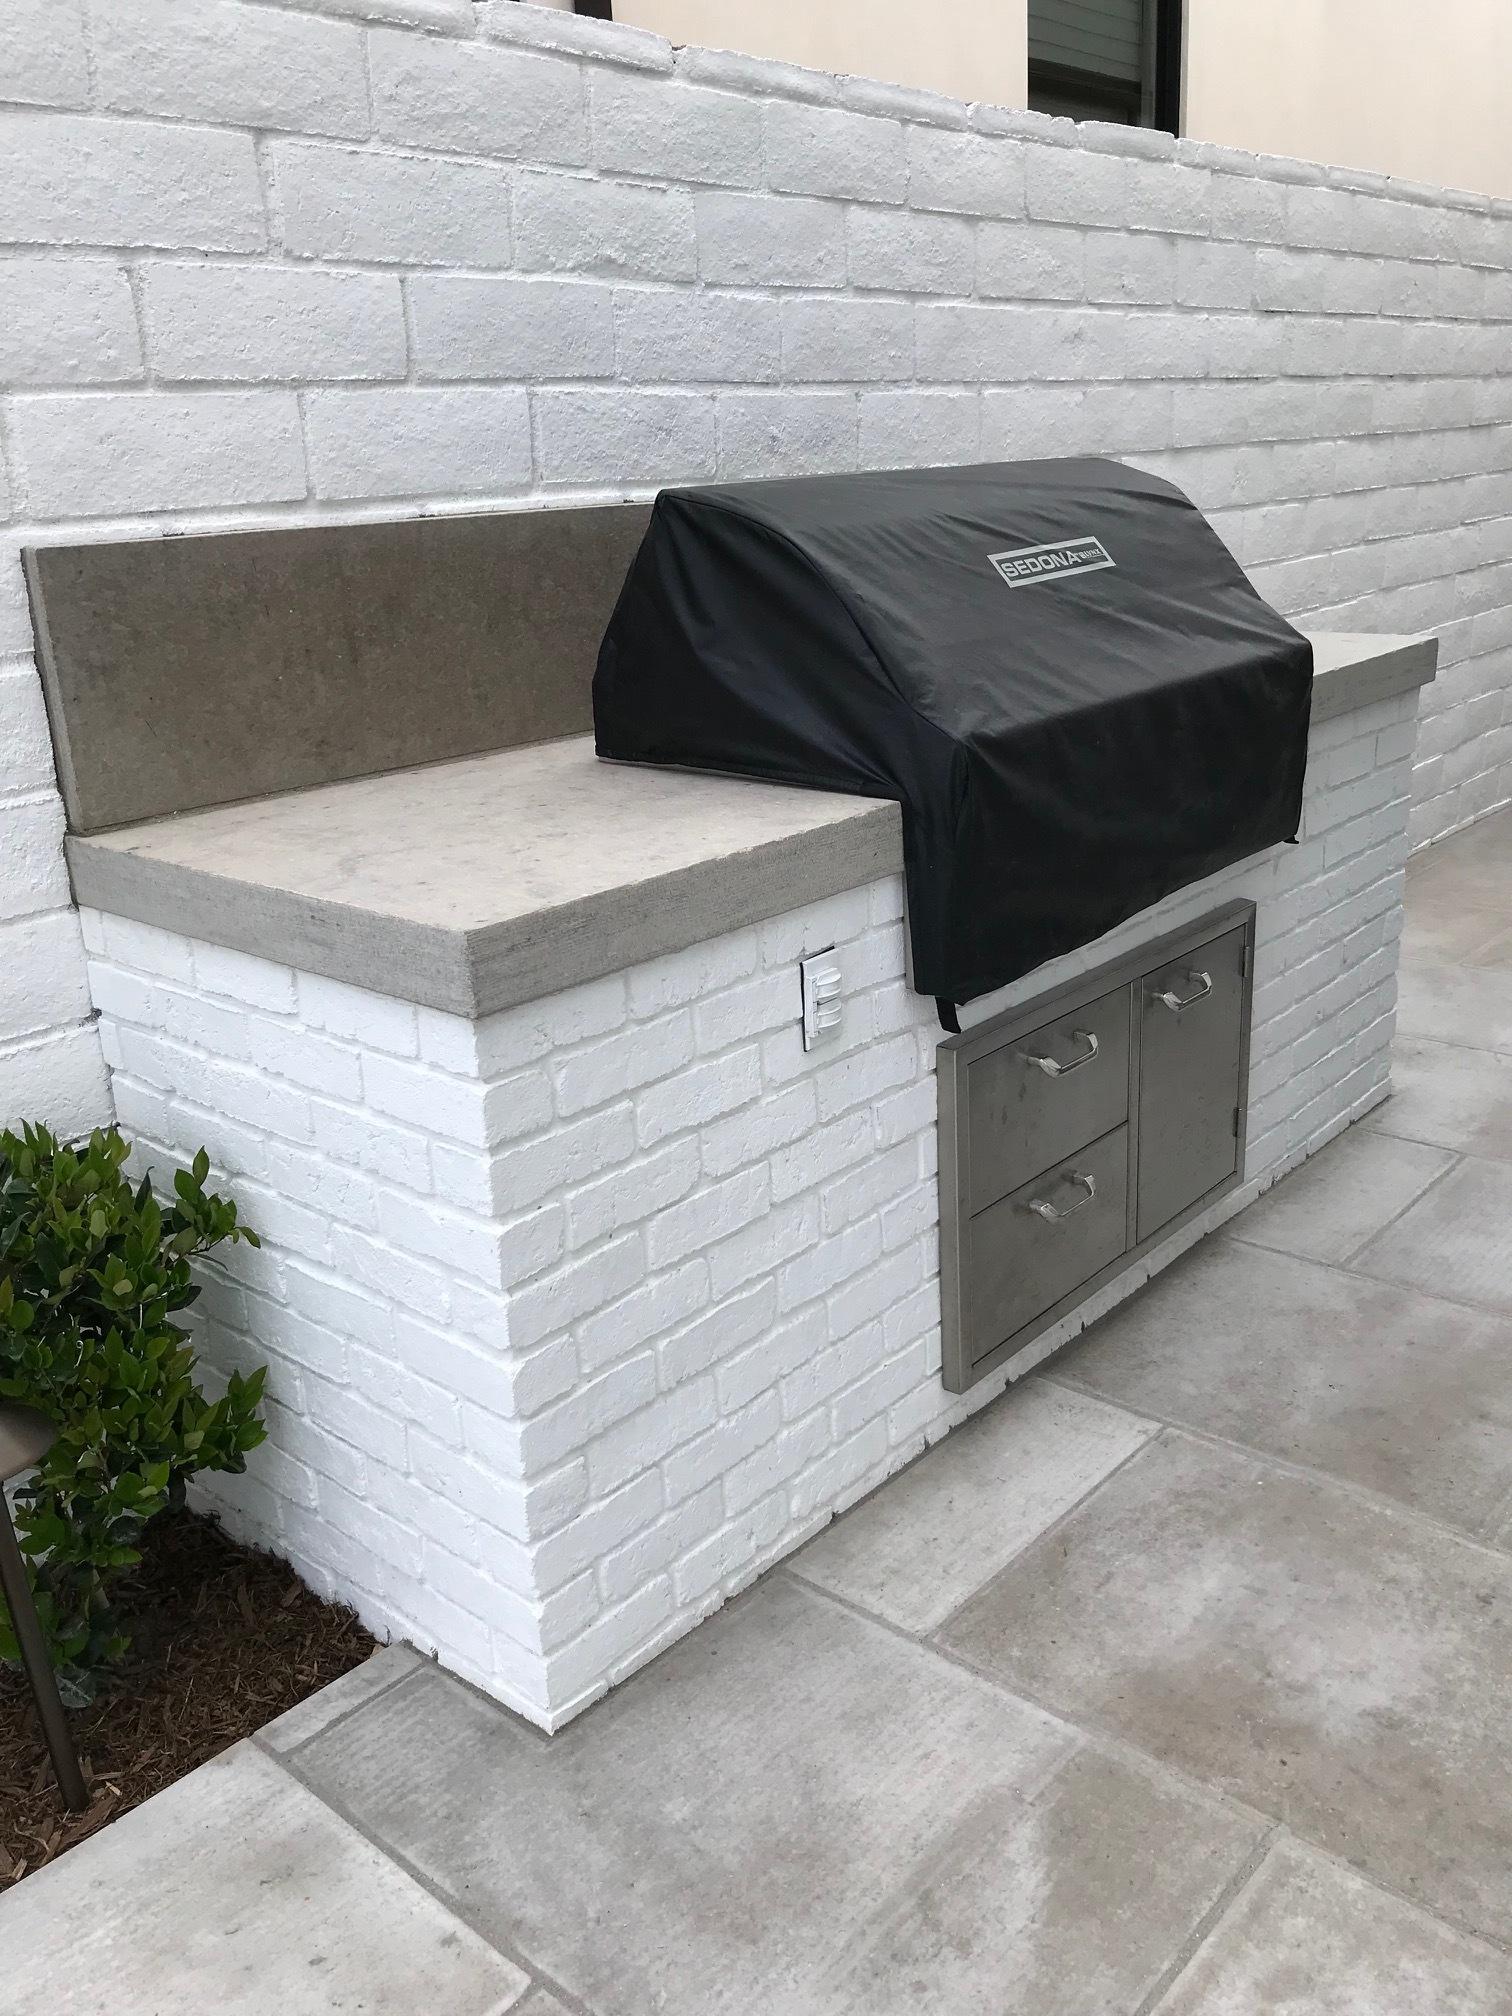 Outdoor masonry kitchen in Dana Point, California, United States